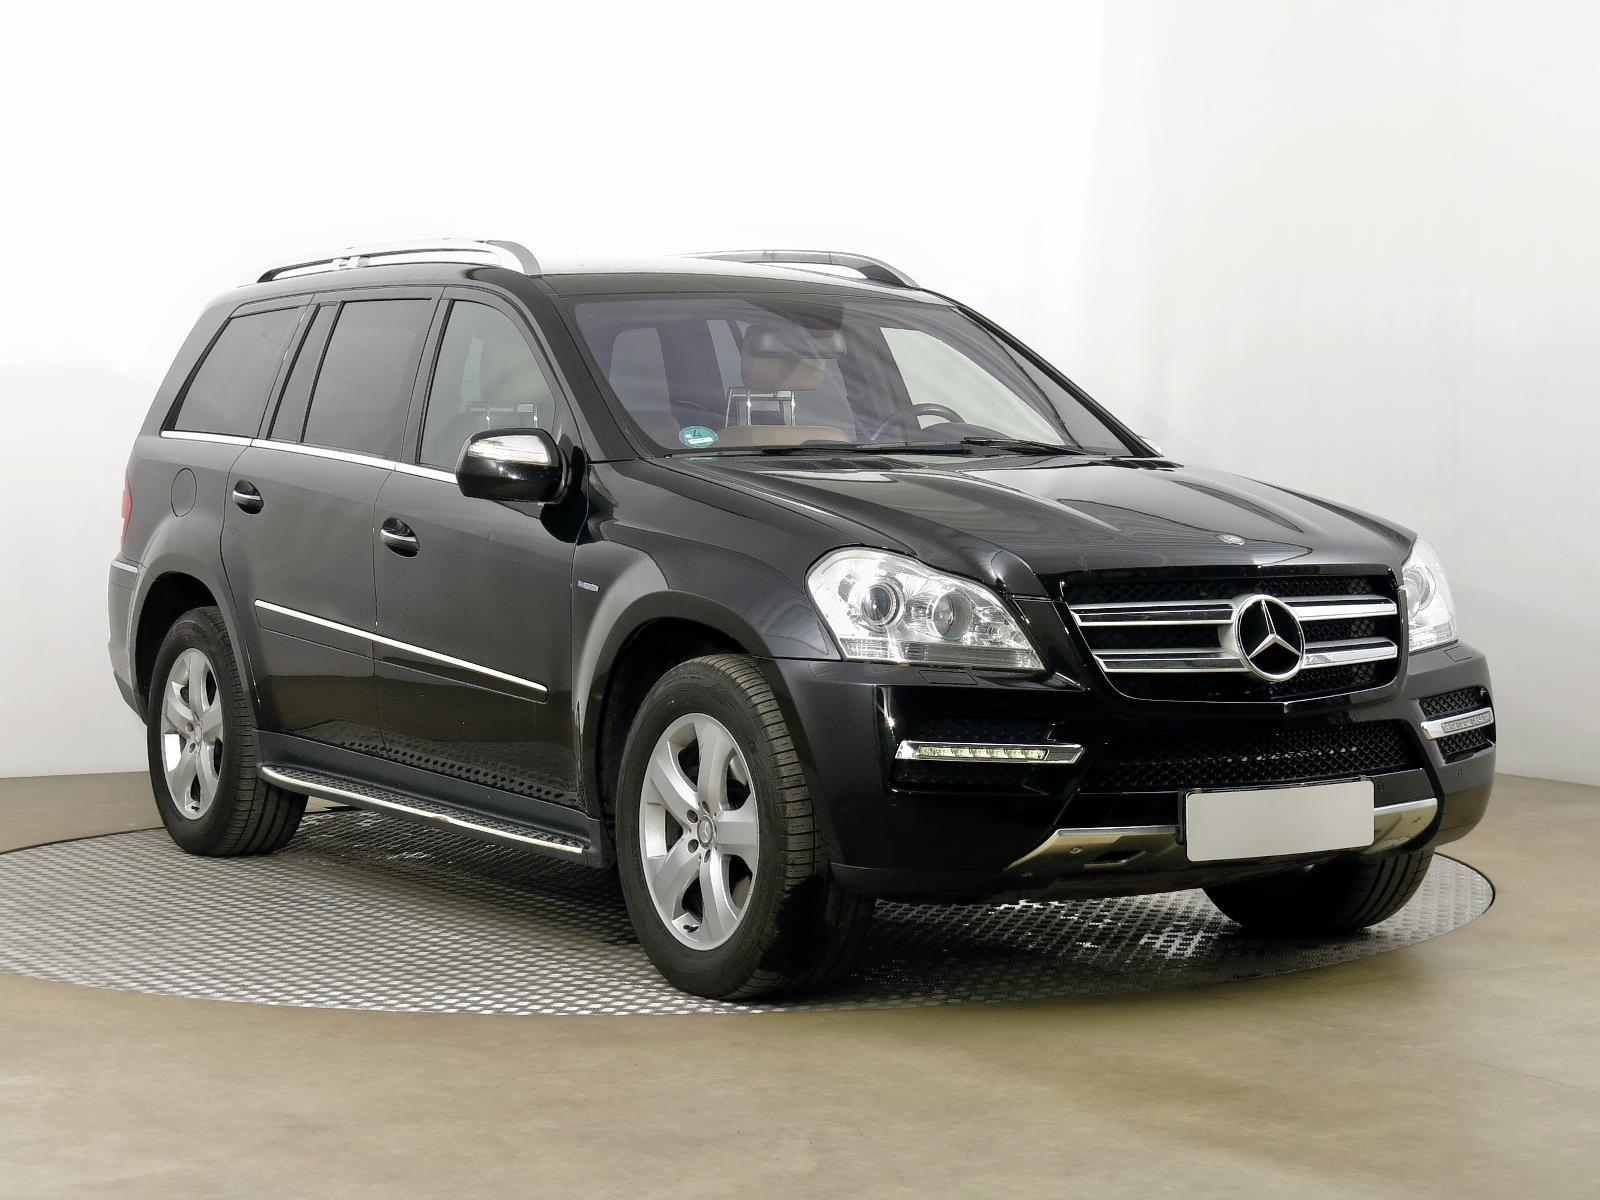 Mercedes-Benz GL 350 CDI 165kW SUV nafta